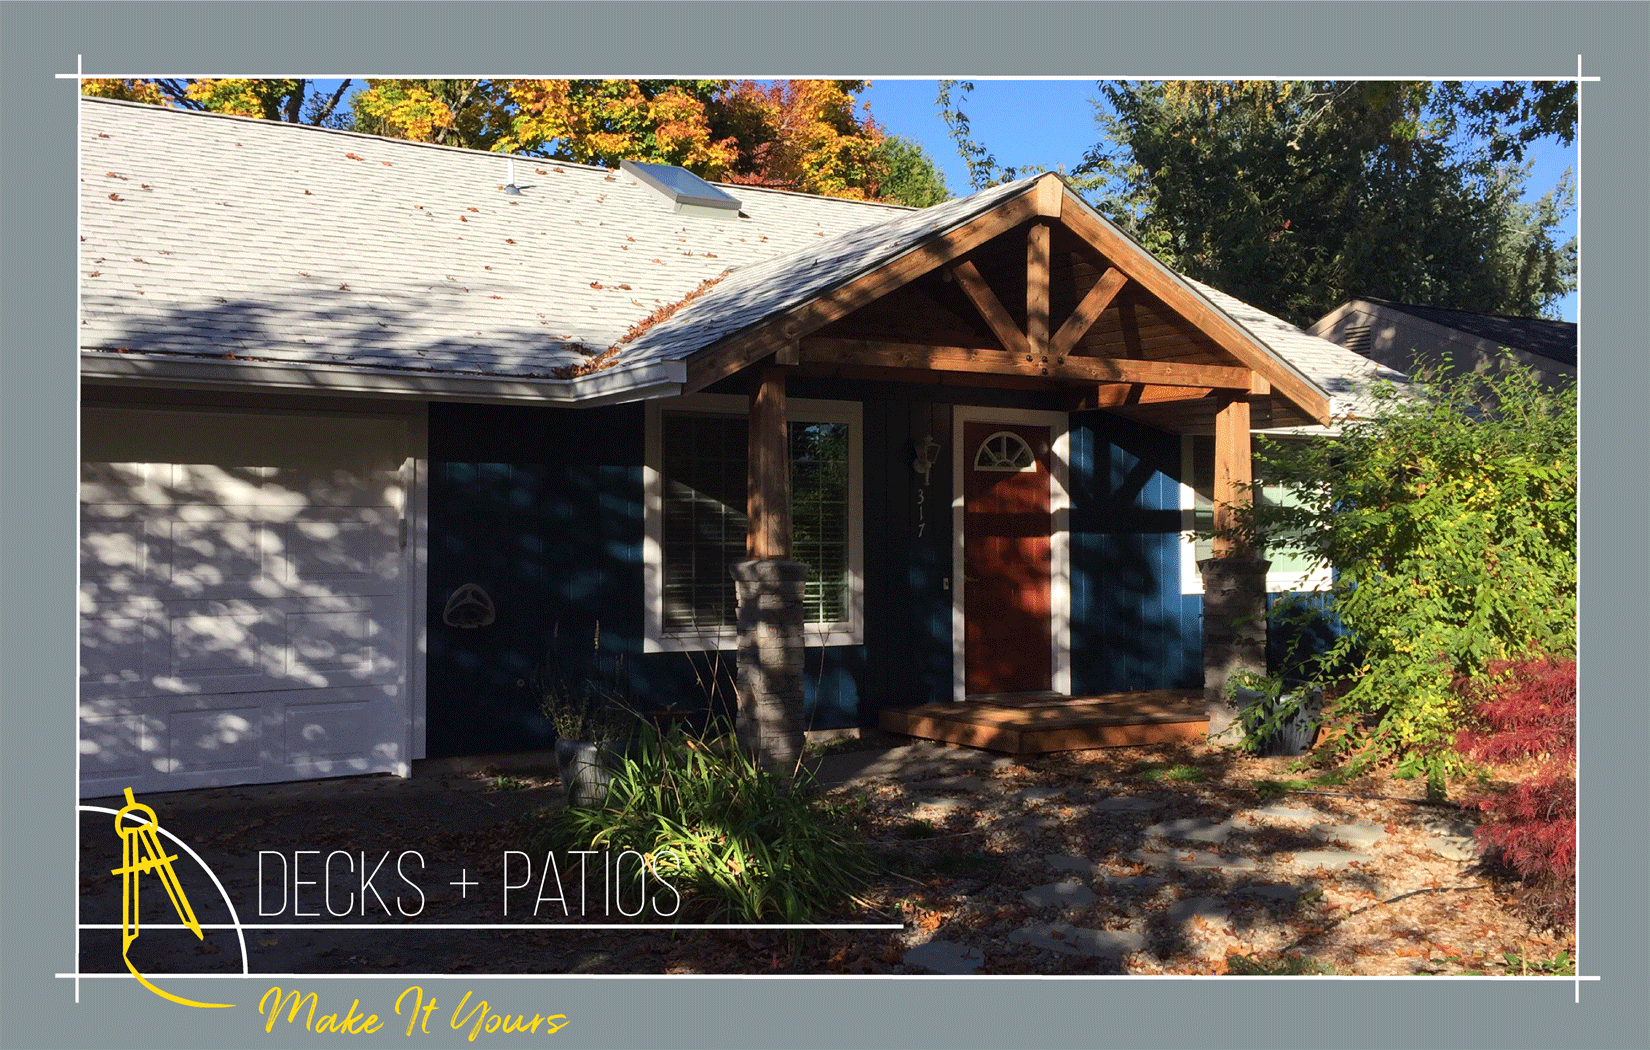 Ashford_website_Gallery_Image-frame_Patios-and-Decks2_v1.png